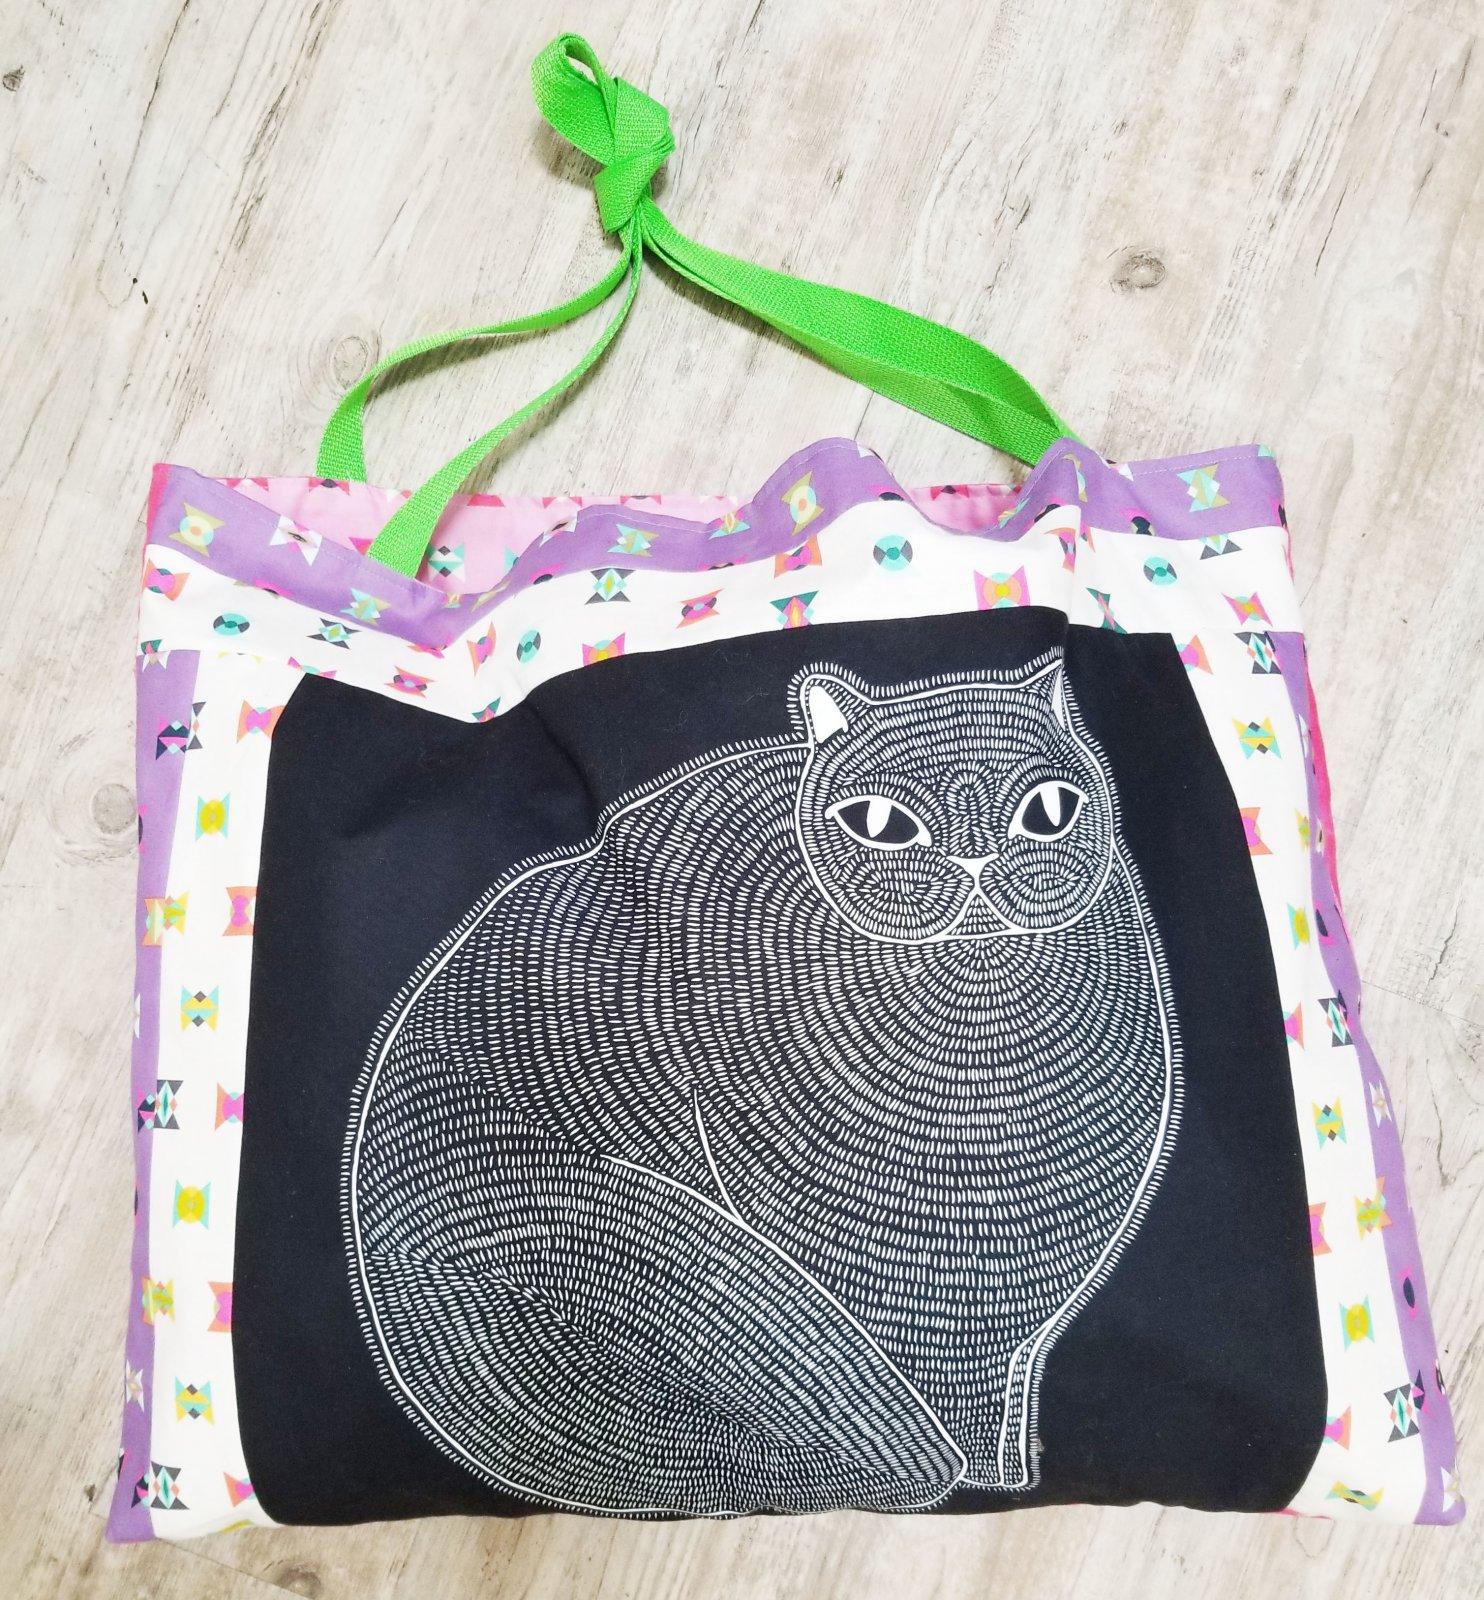 Gingiber Catnip Panel Bag + Pattern (Black)